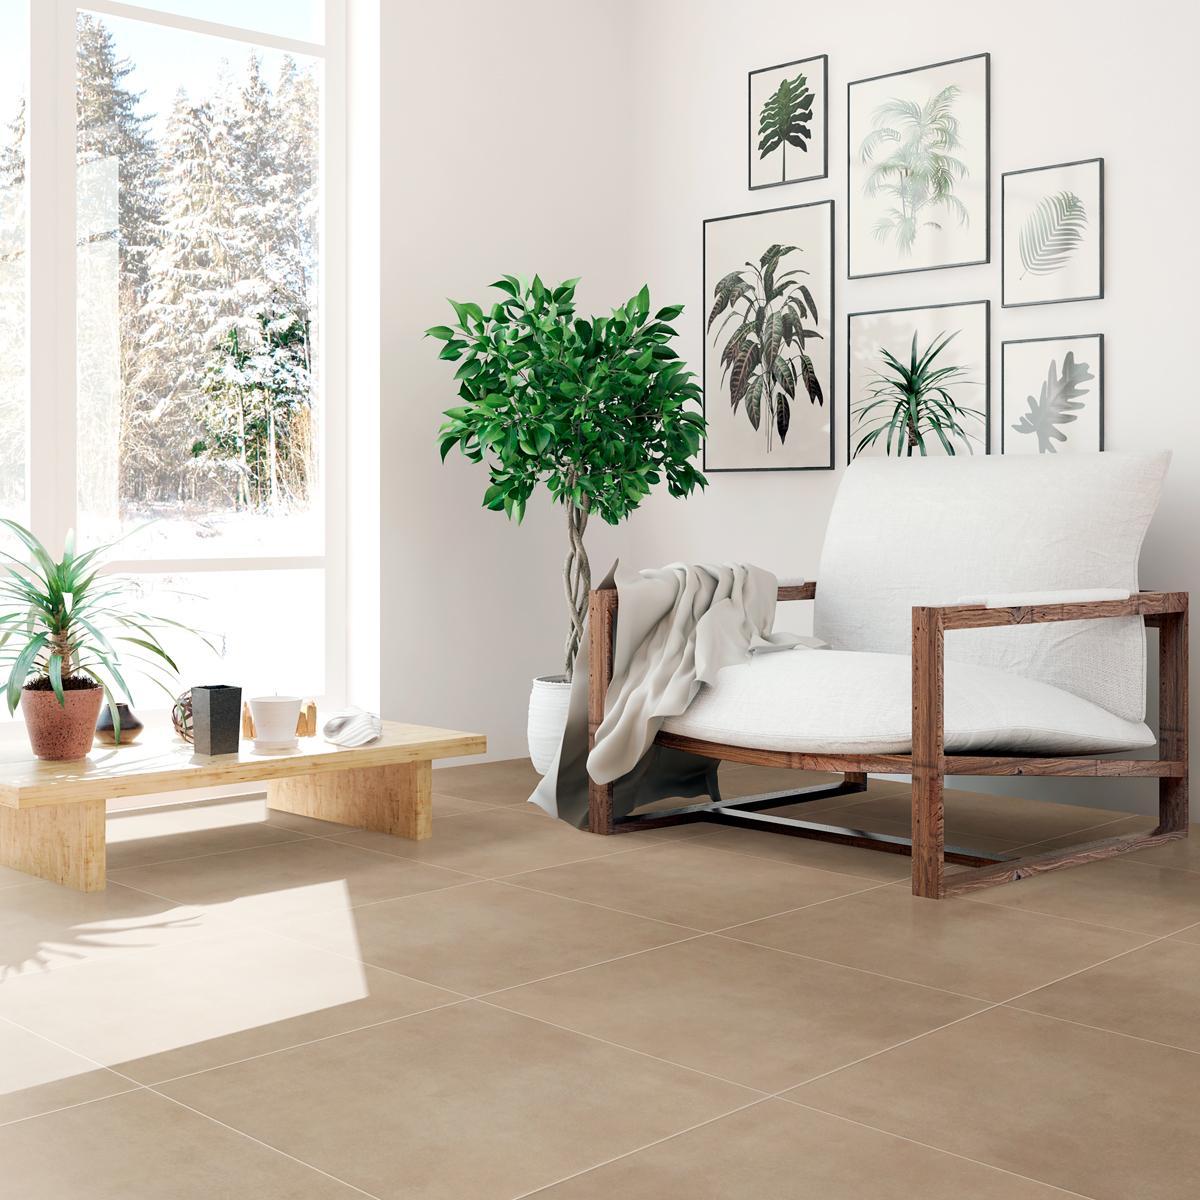 Porcelanato Viena Marfil Mate - 60X60 cm - 1.44 m2